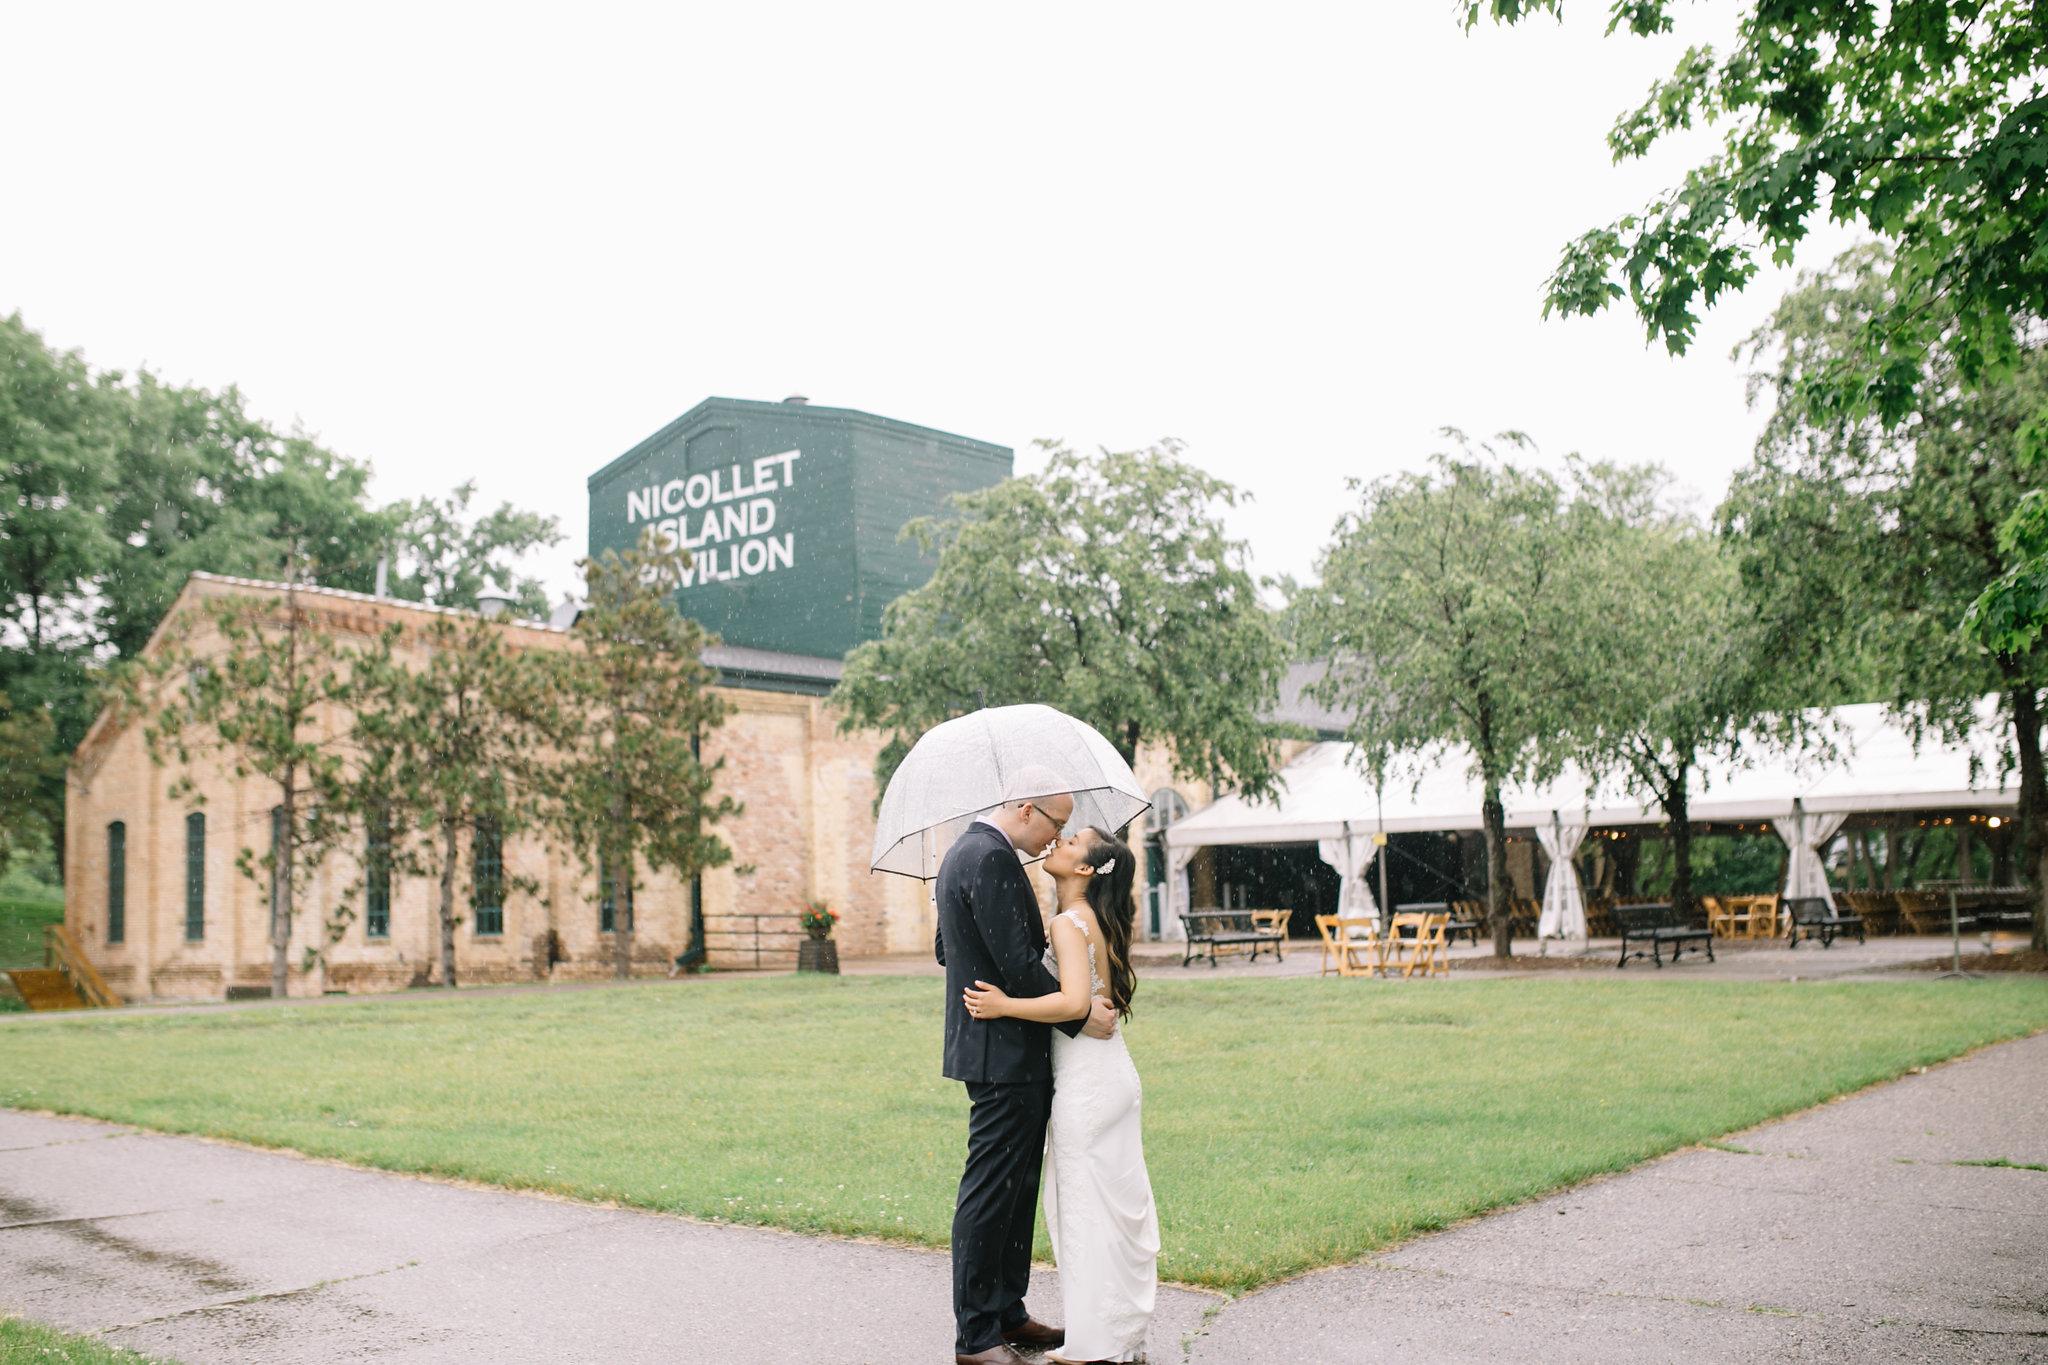 clear umbrella, Whims and Joy Minneapolis photographer :: Sixpence Events & Planning Minnesota wedding planner :: Nicollet Island Pavilion.jpg